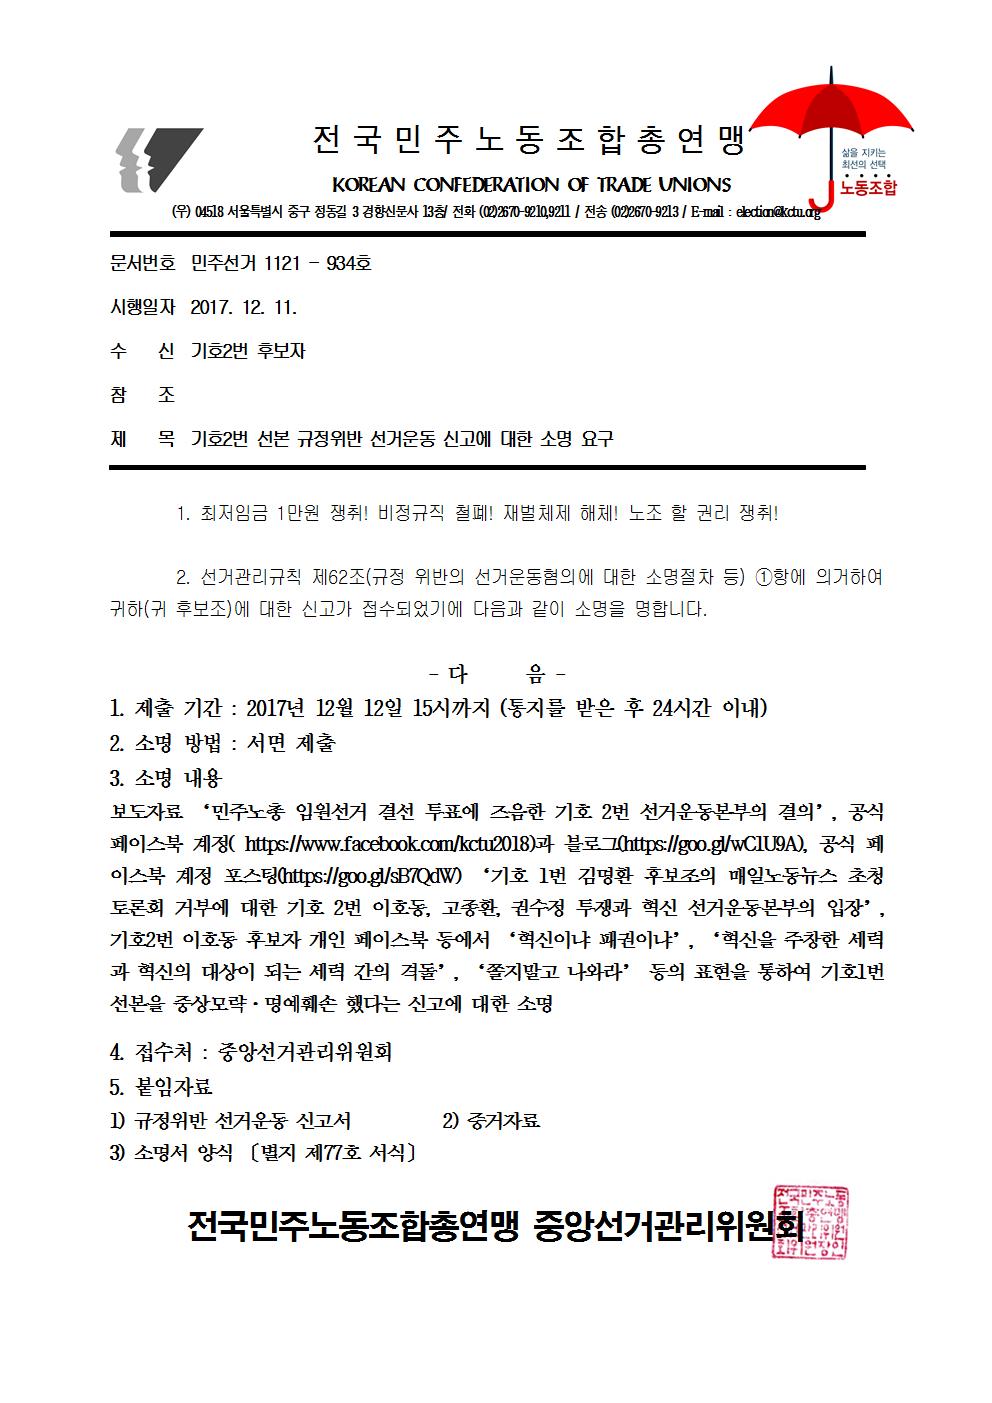 17kctu934_기호2번 선본 규정위반 선거운동 신고에 대한 소명 요구001.png